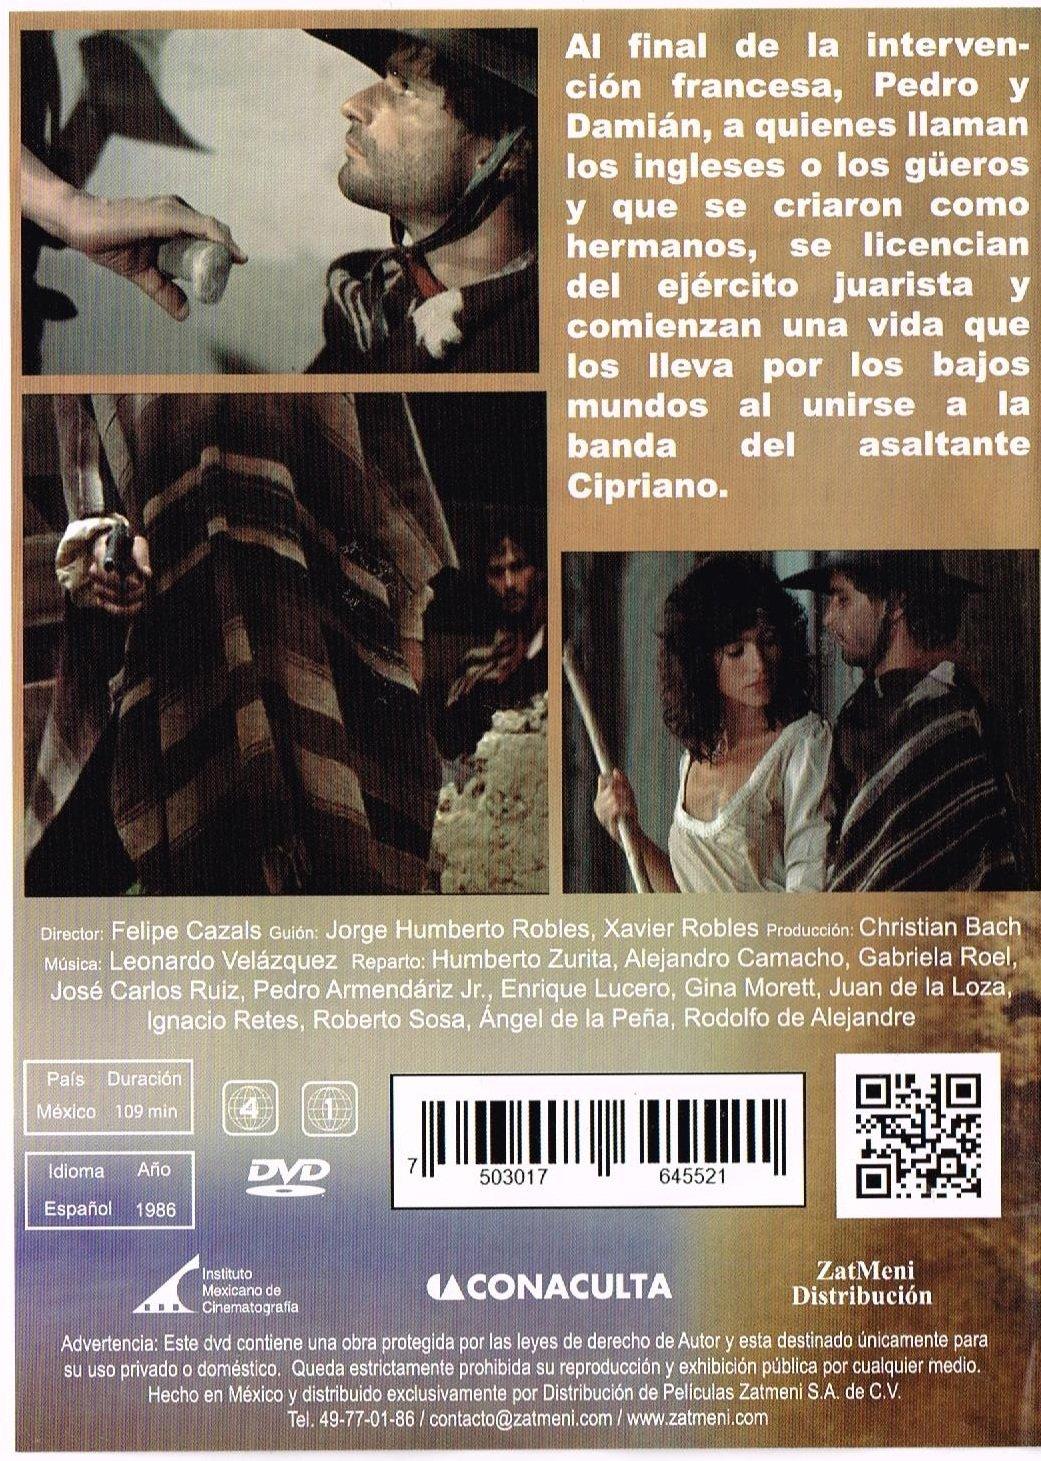 Amazon.com: EL TRES DE COPAS [ALEJANDRO CAMACHO,HUMBERTO ZURITA,GABRIELA ROEL] [Ntsc/region 1 and 4 Dvd. Import - Latin America].: Movies & TV